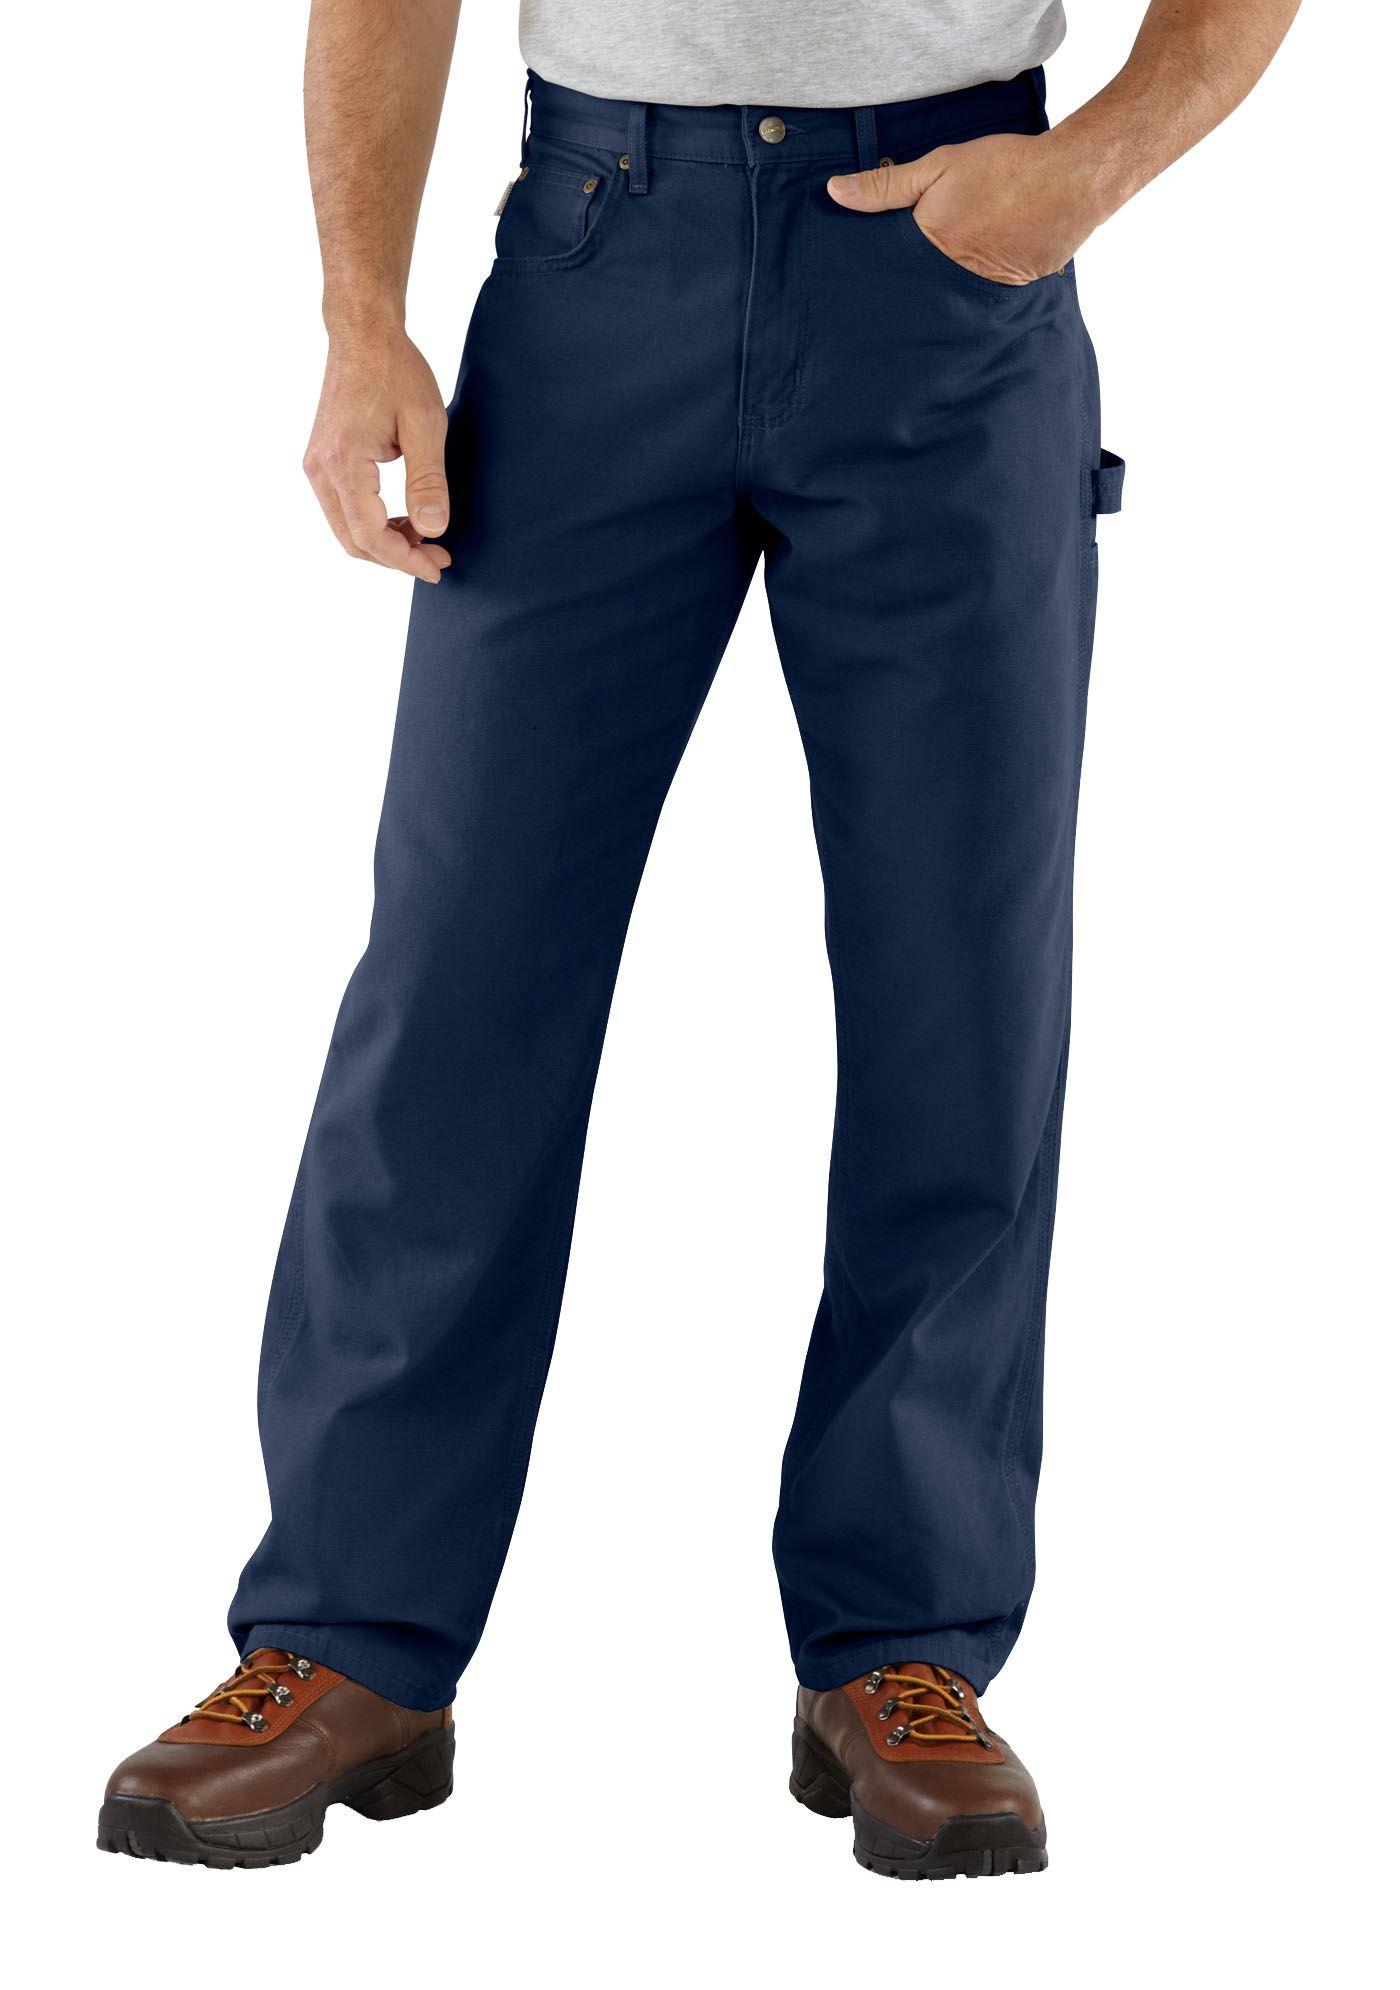 Carhartt Men's Canvas Carpenter Jeans